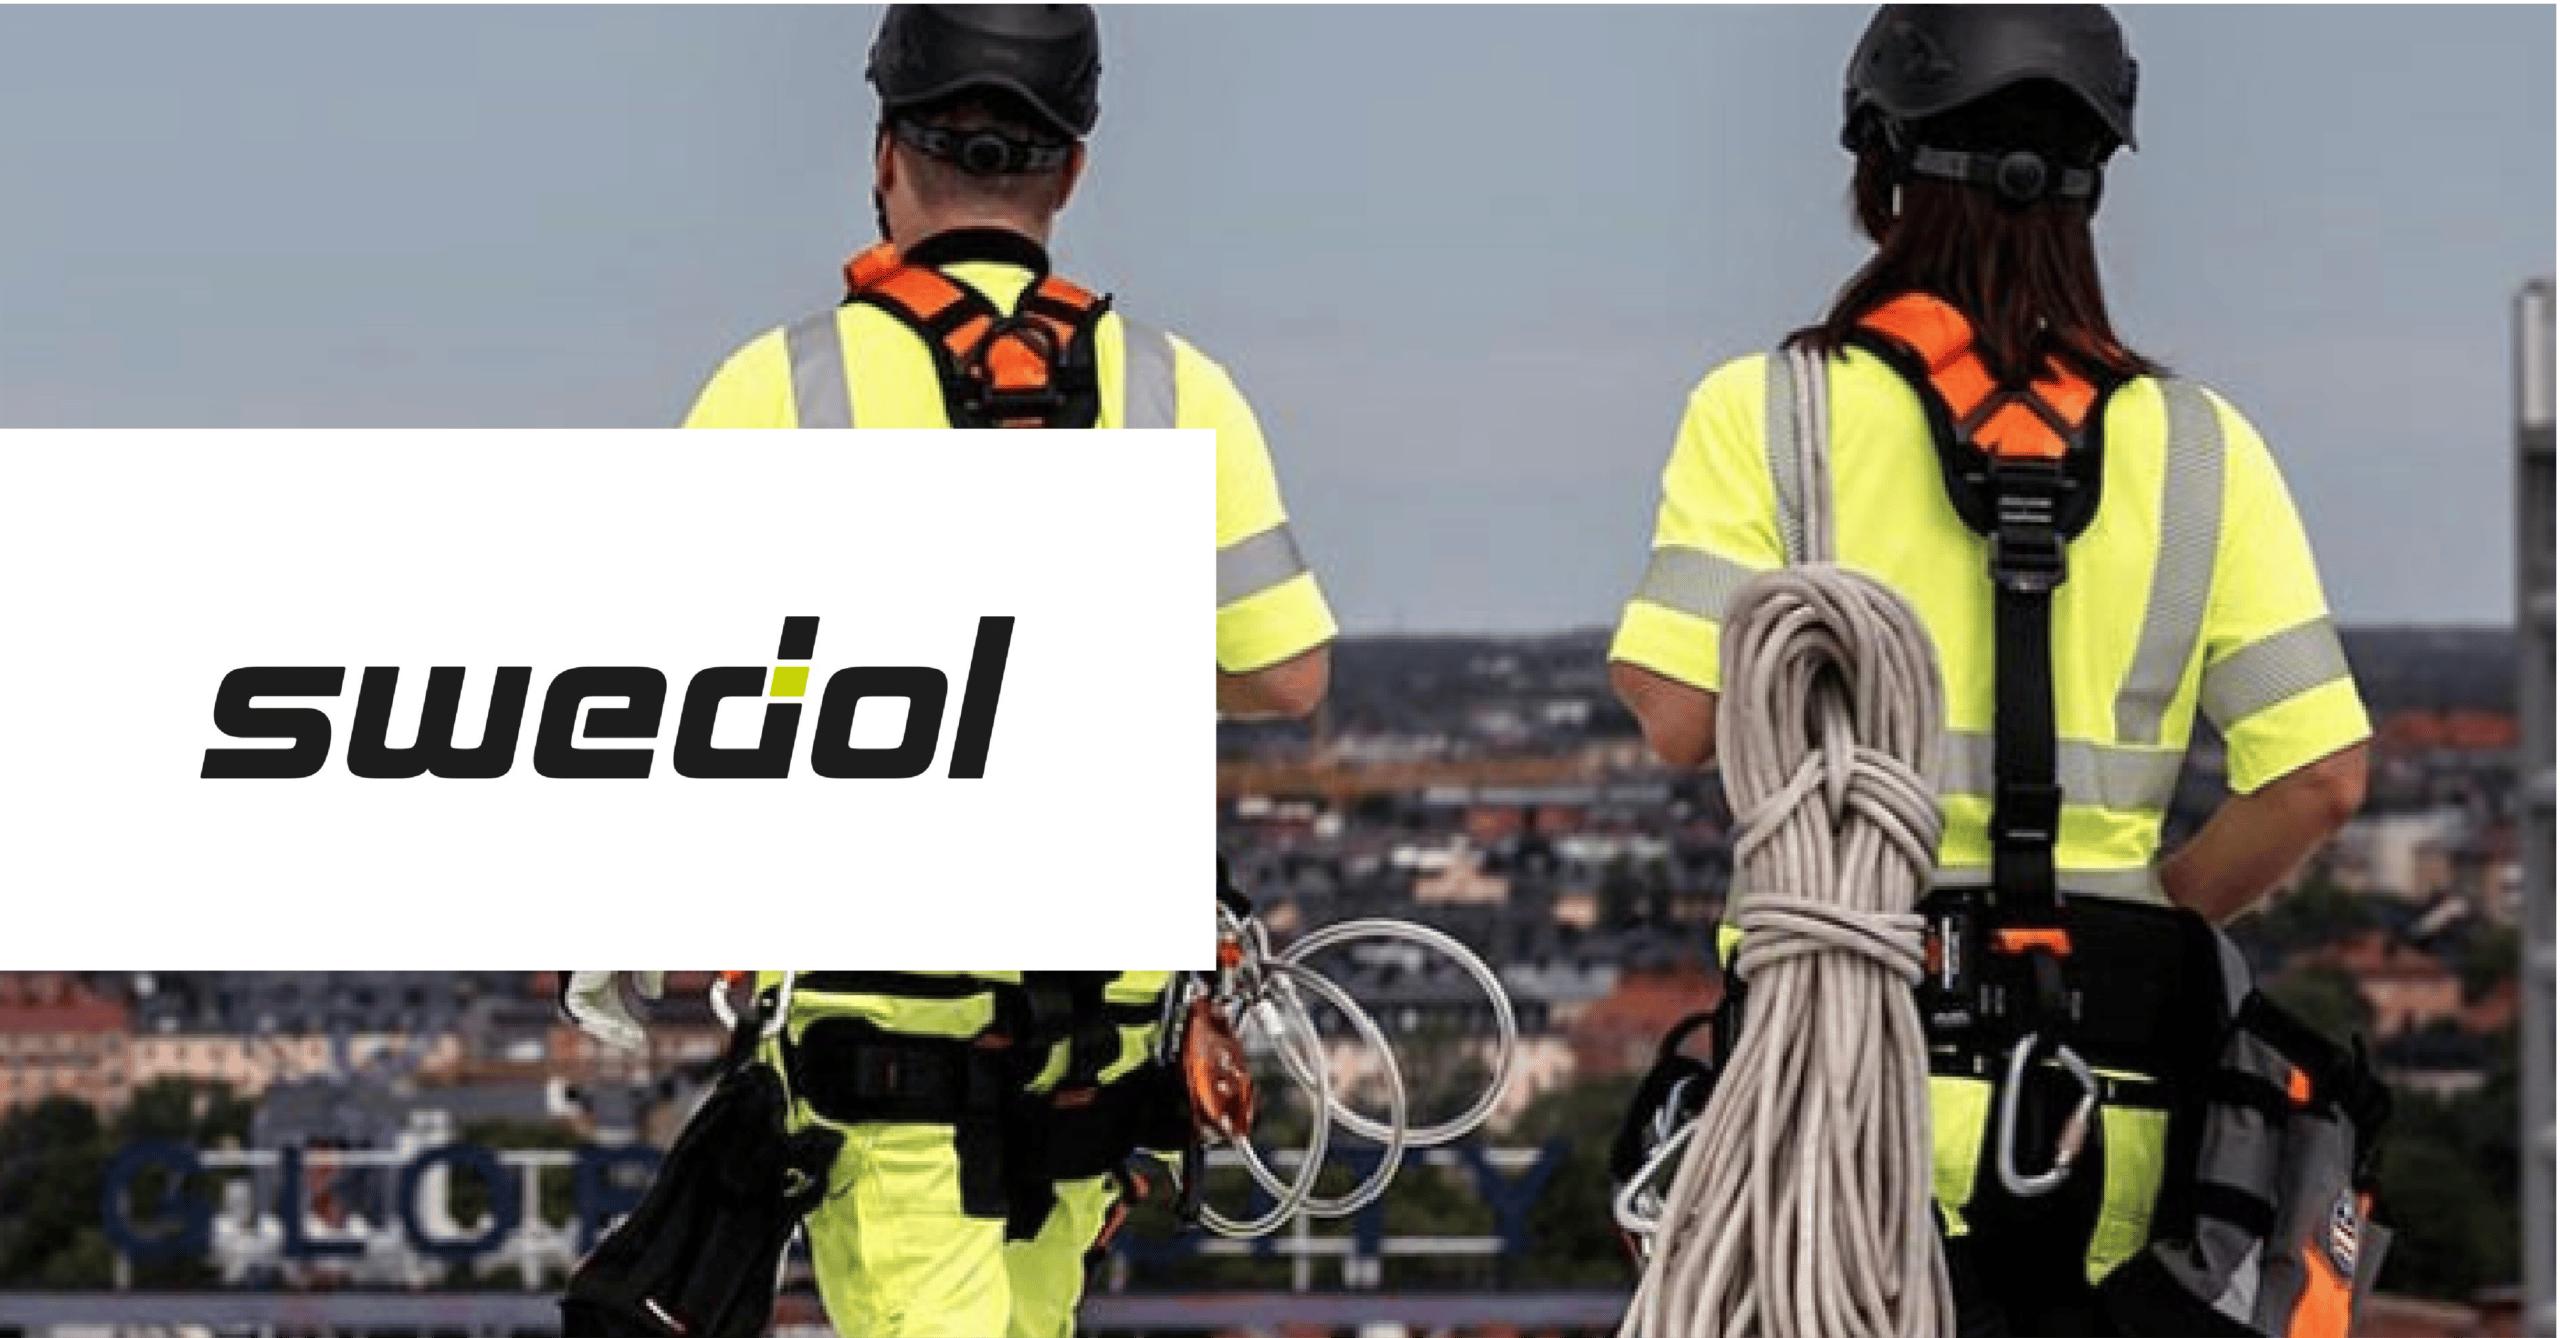 Swedol effektiviserar sina fakturaprocesser med Logiq